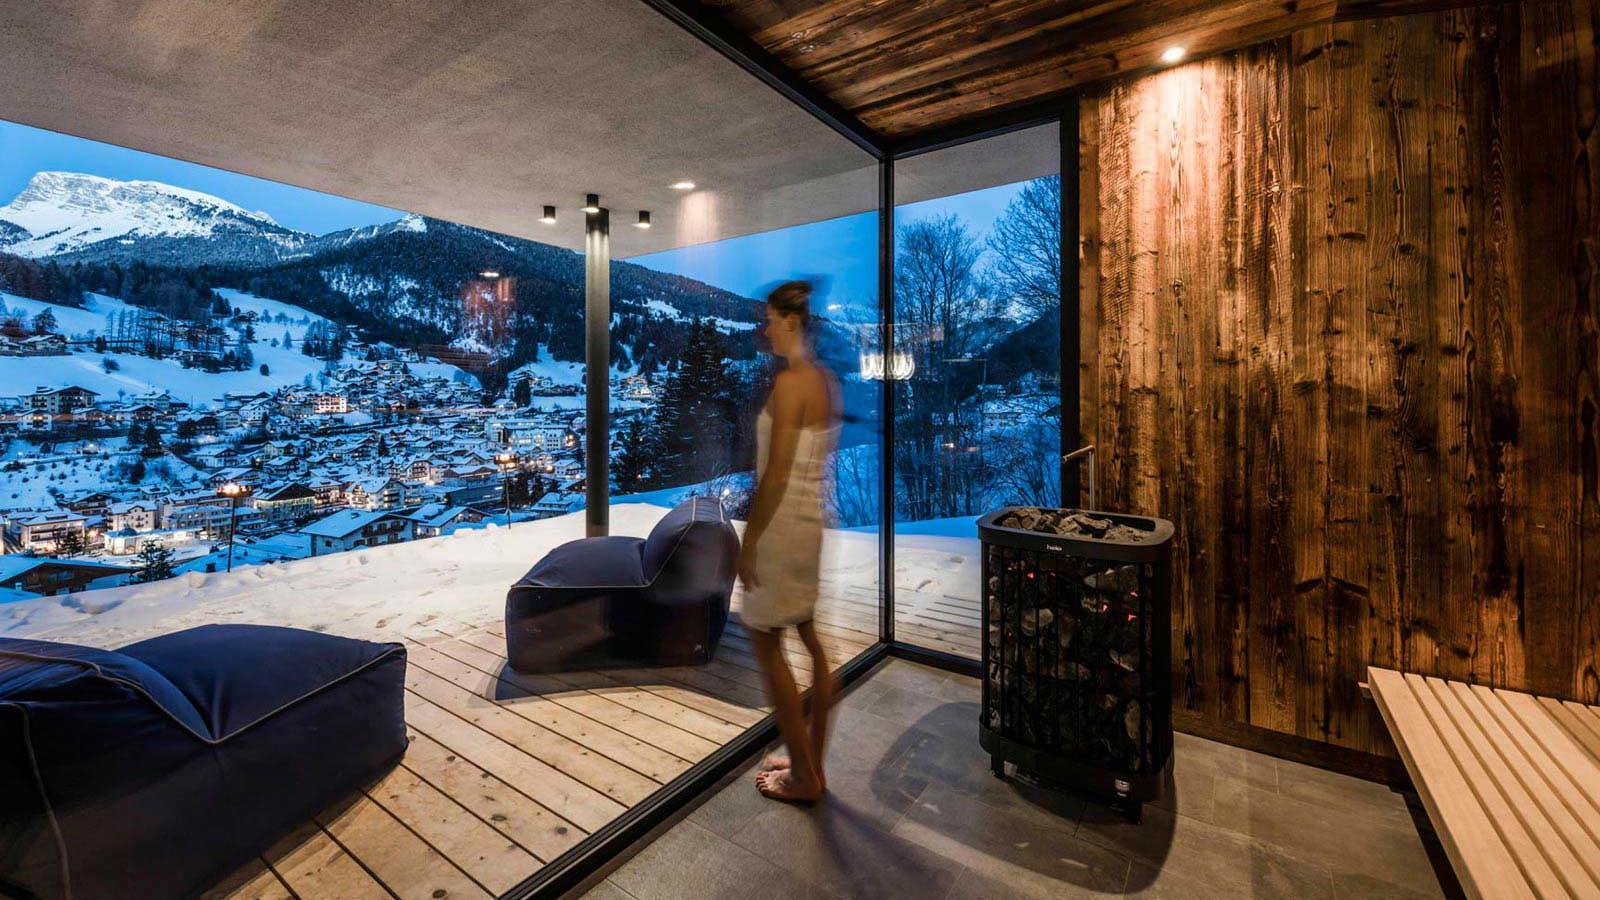 Alpenhotel Rainell - Sauna at night